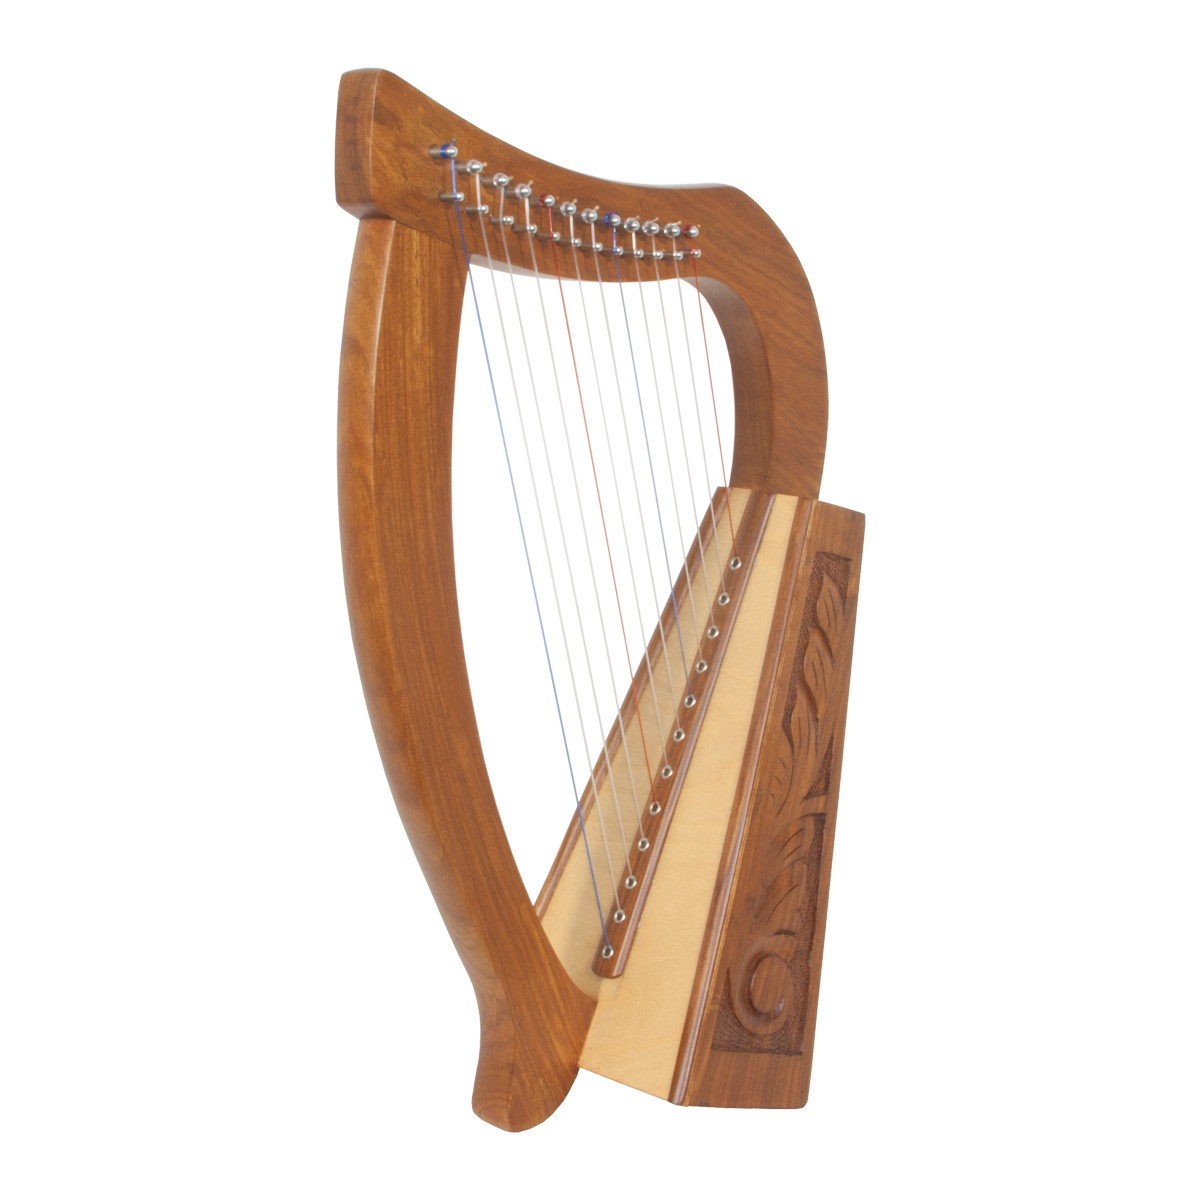 Roosebeck Baby Harp 12-String